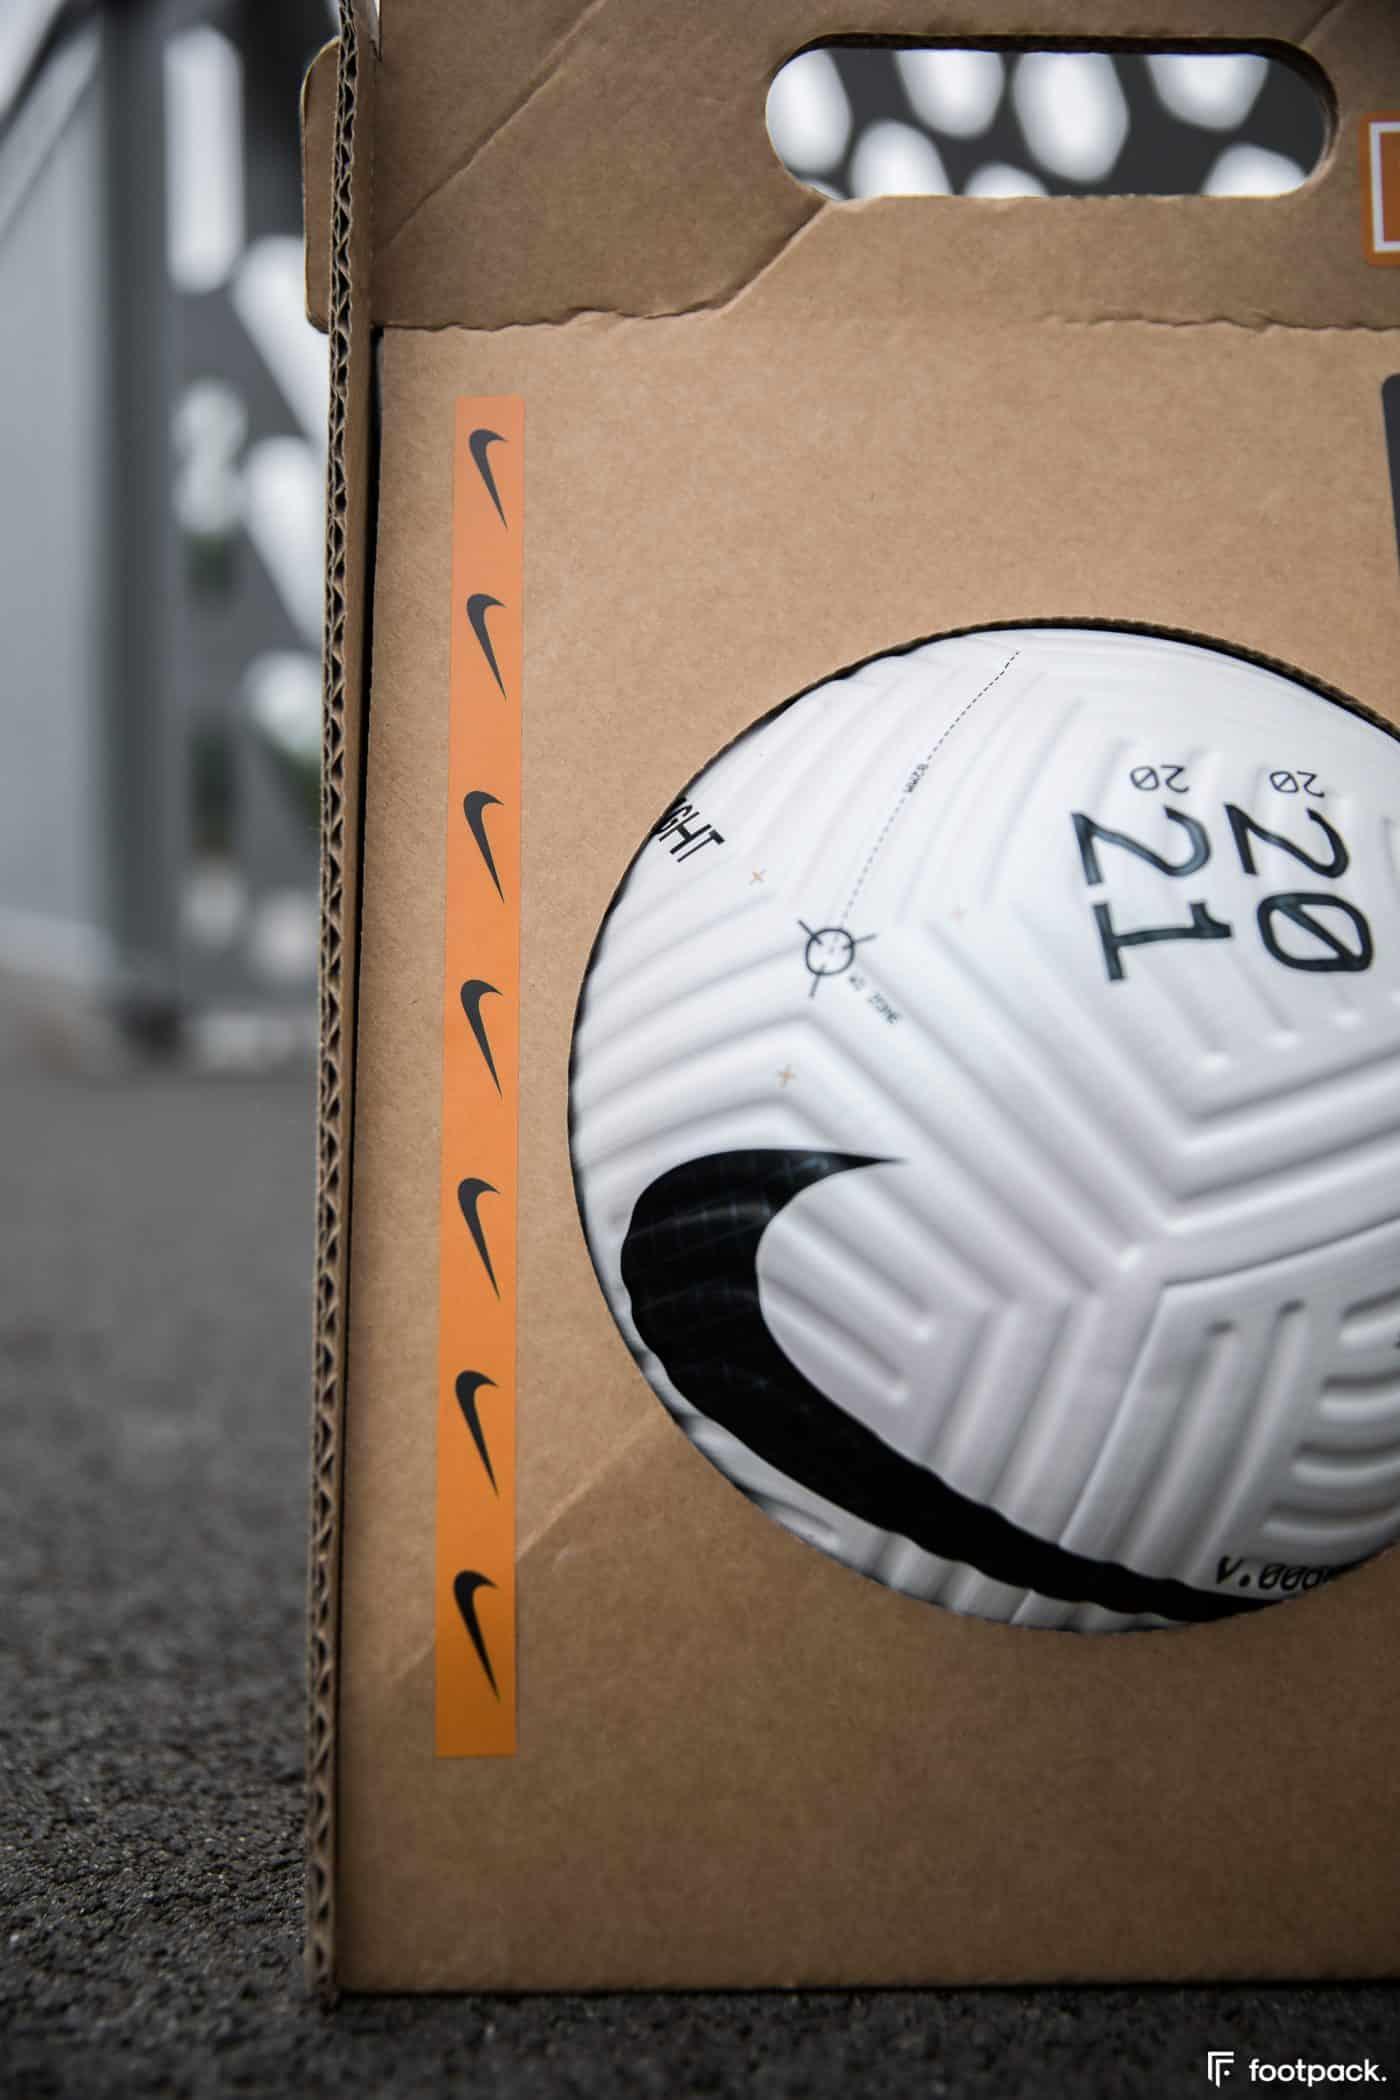 ballon-nike-flight-premier-league-serie-a-footpack-4